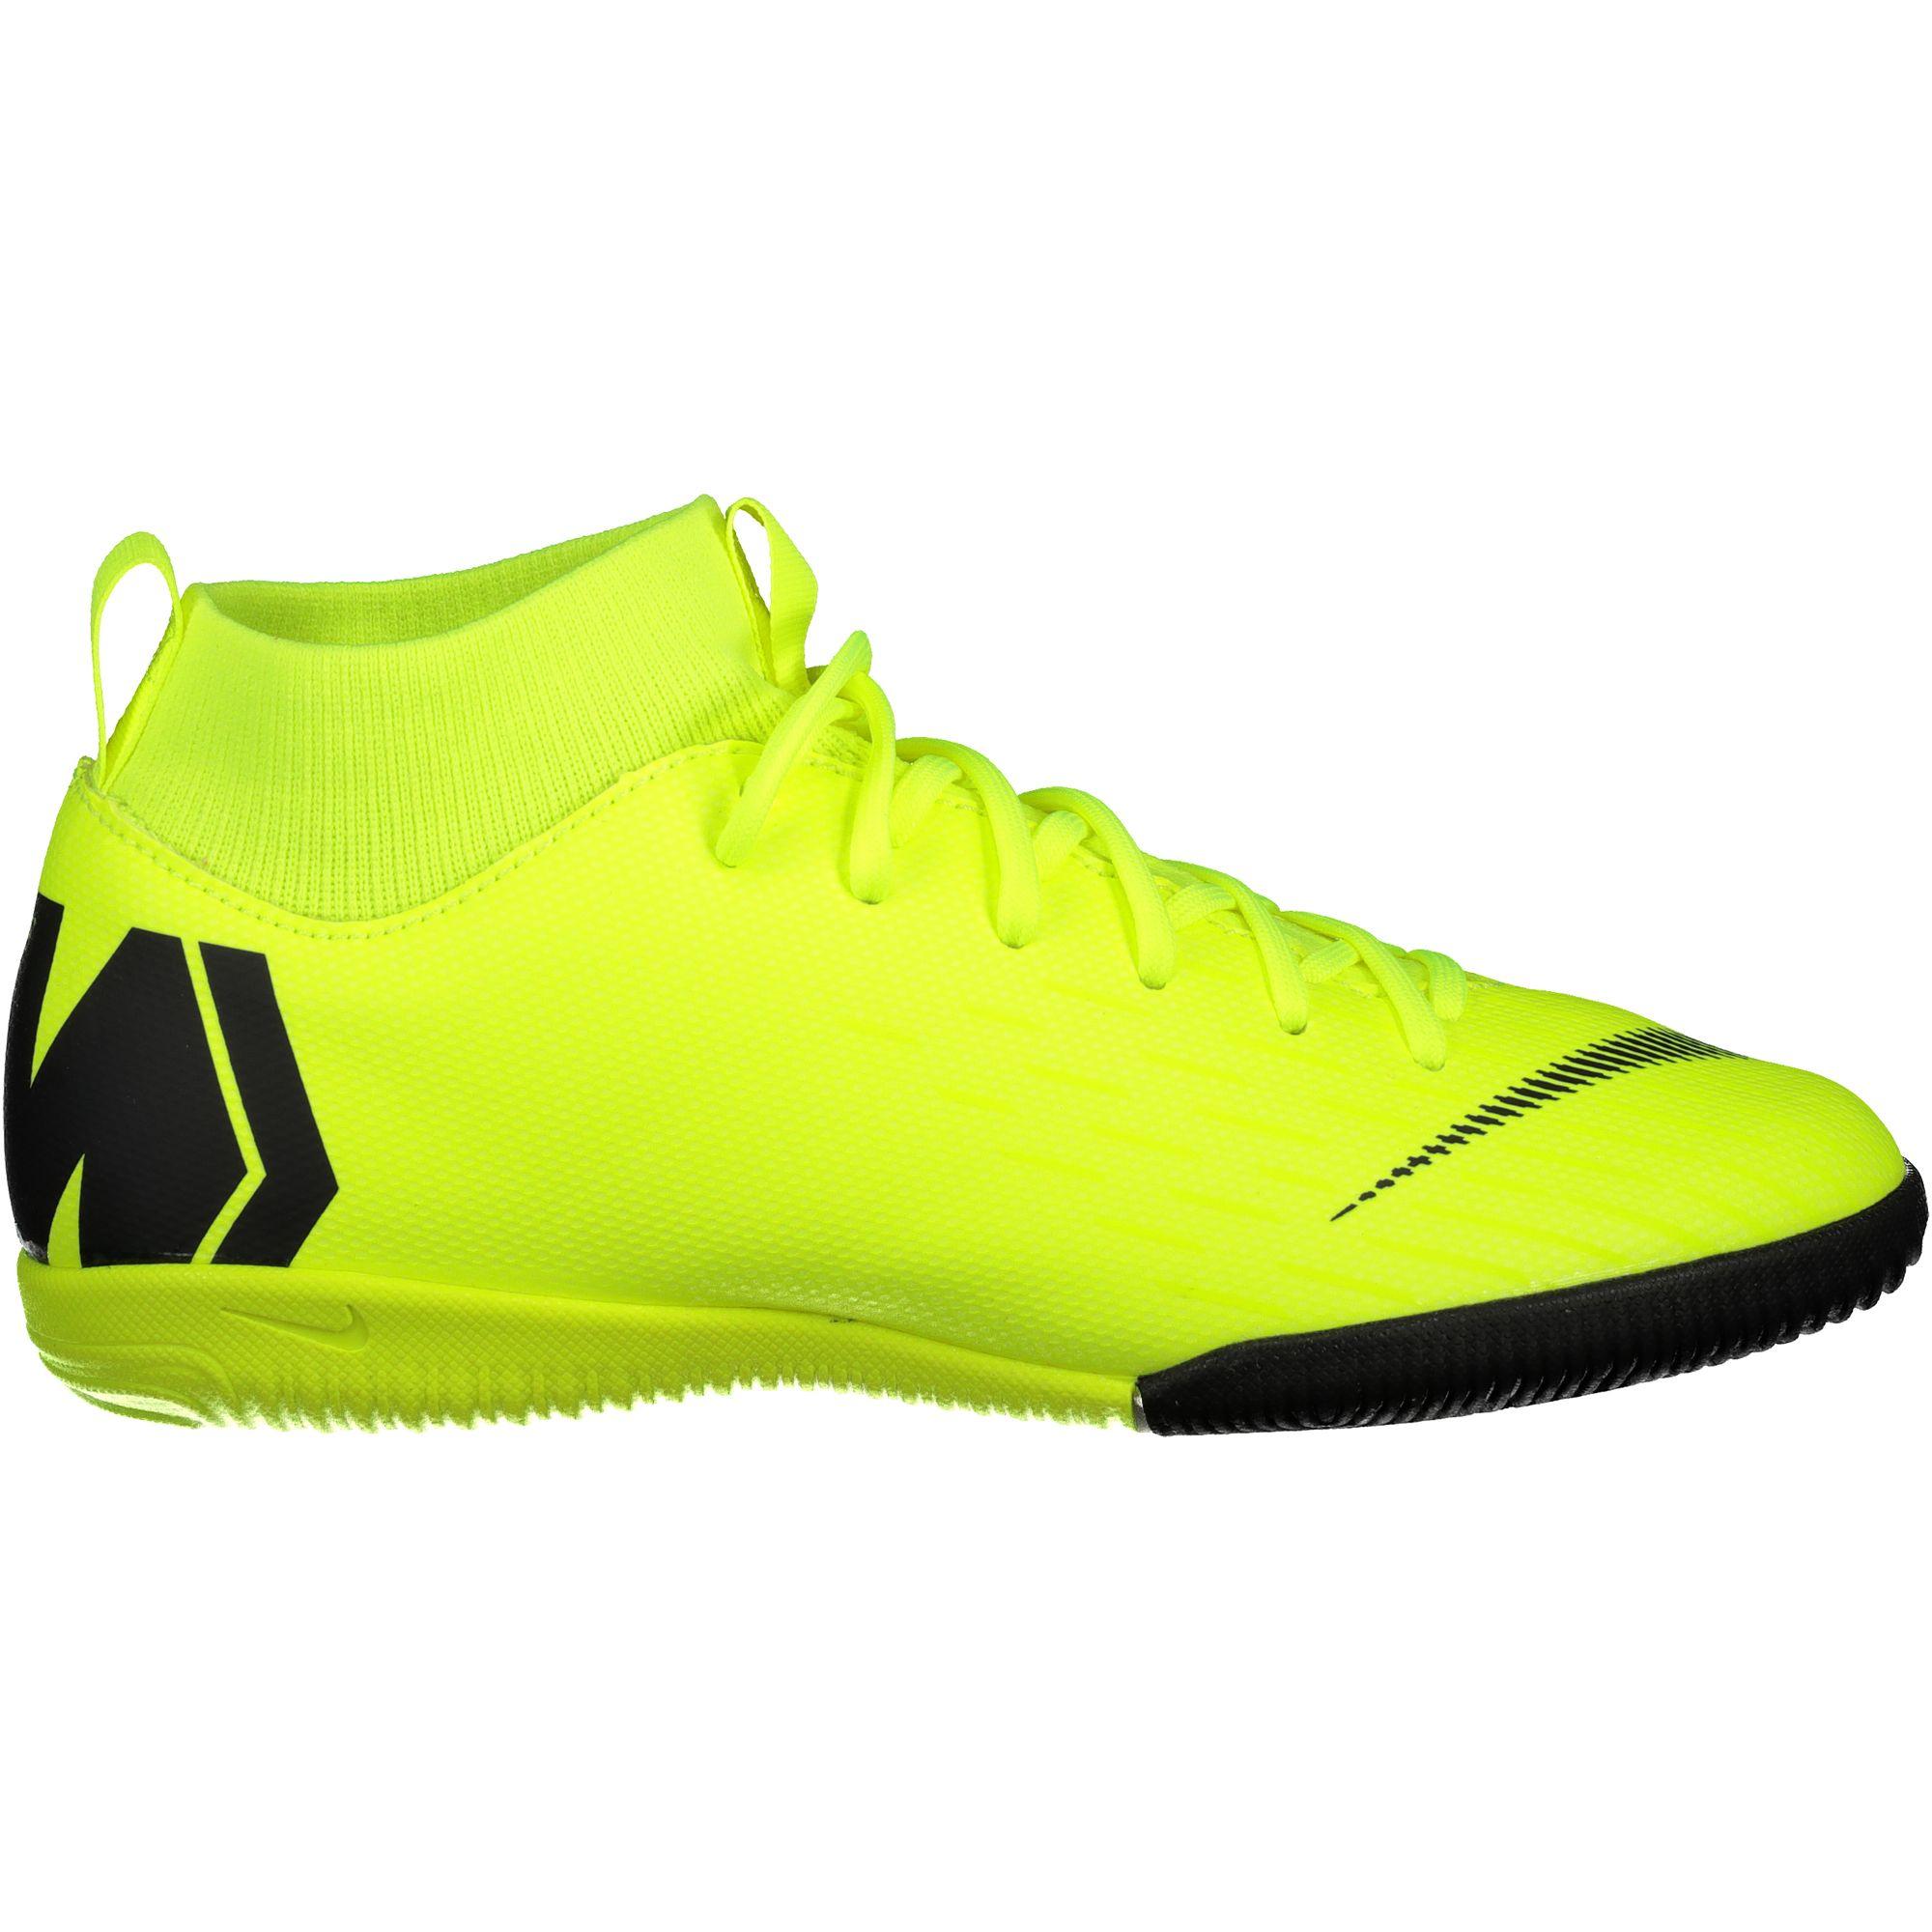 Nike Superfly 6 Academy Fußballschuhe Halle IC Kinder Schuhe Kids Schuhe  Fußballschuhe